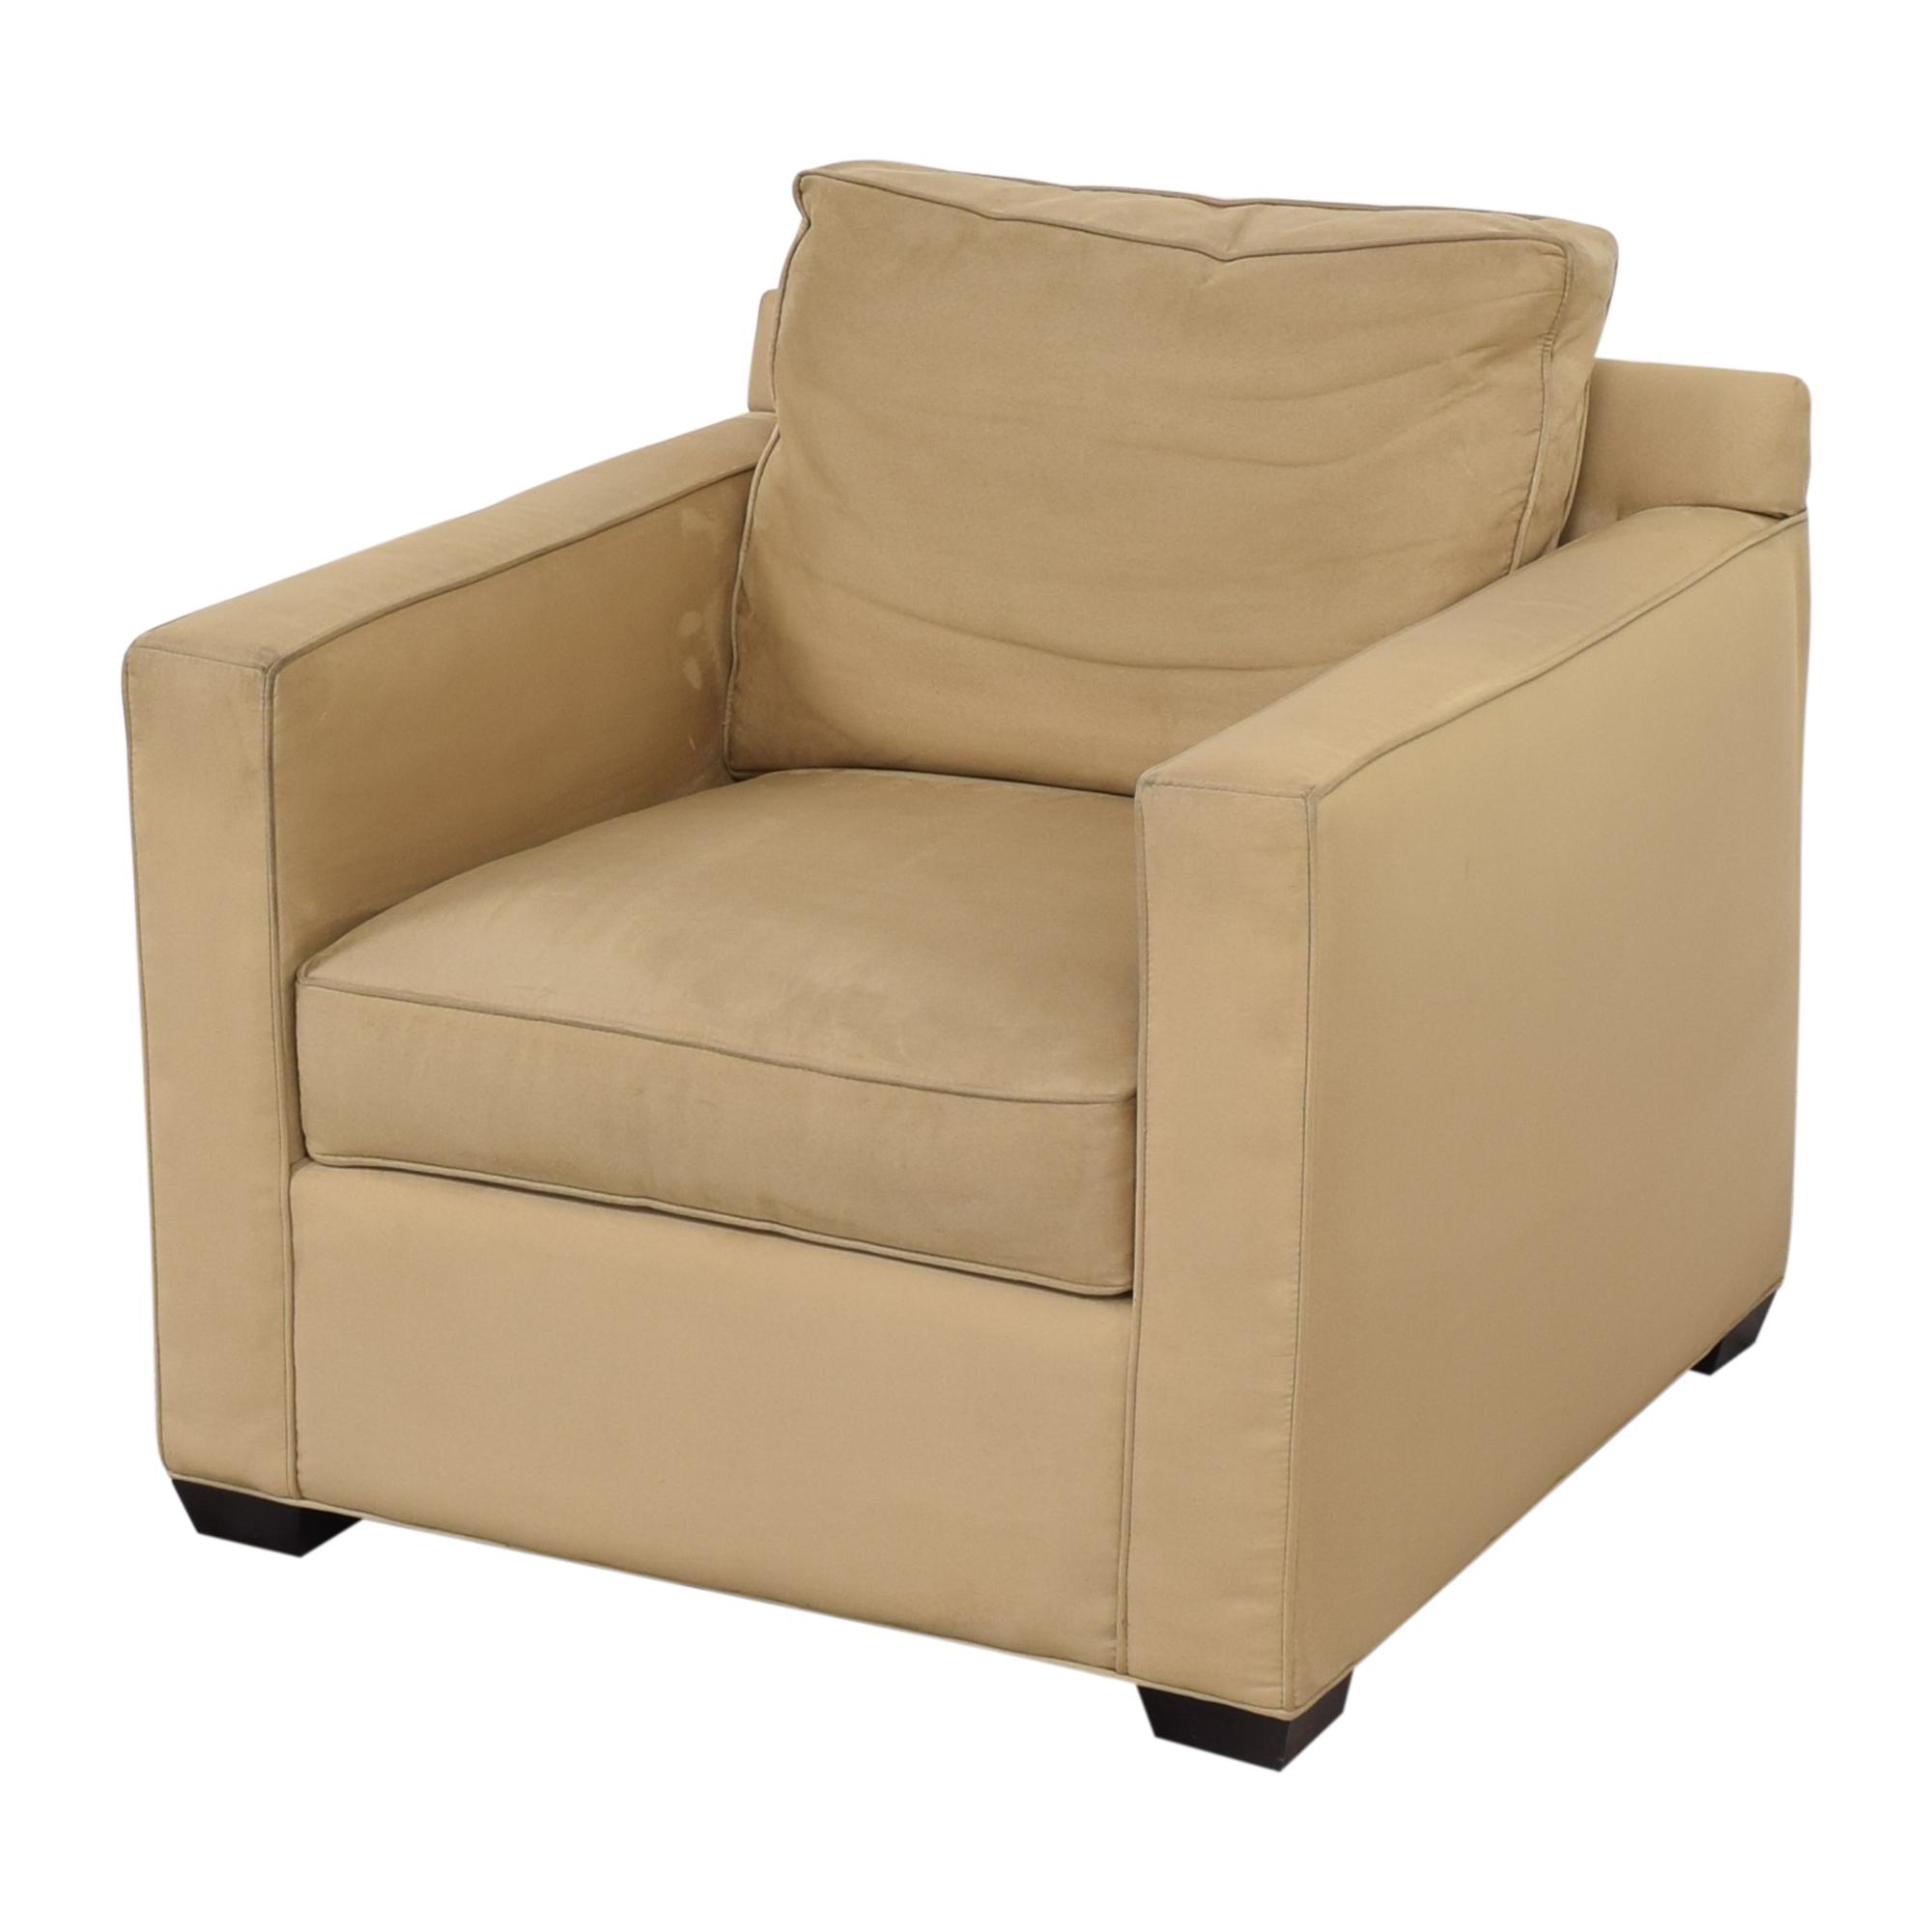 shop Crate & Barrel Davis Beige Accent Chair Crate & Barrel Accent Chairs